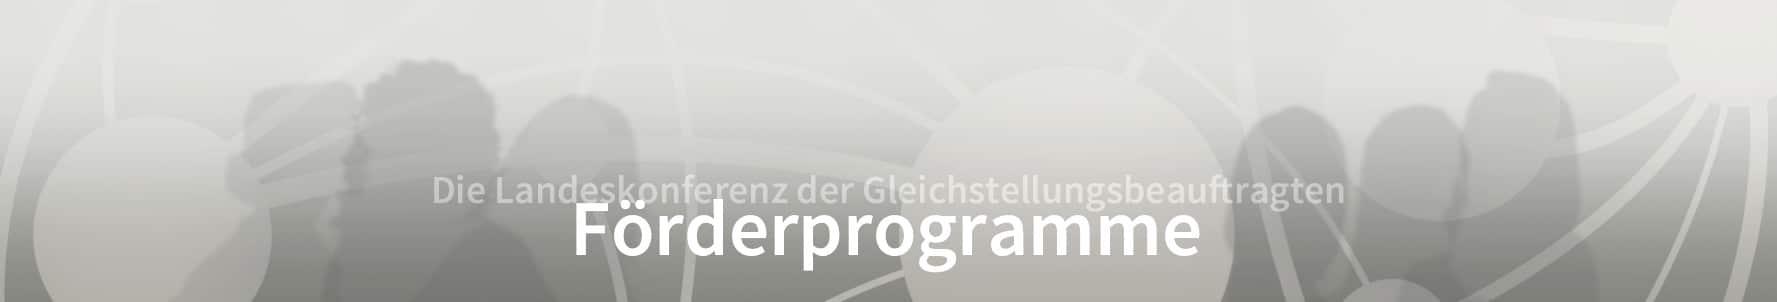 Headerbild LaKoG Baden-Württemberg